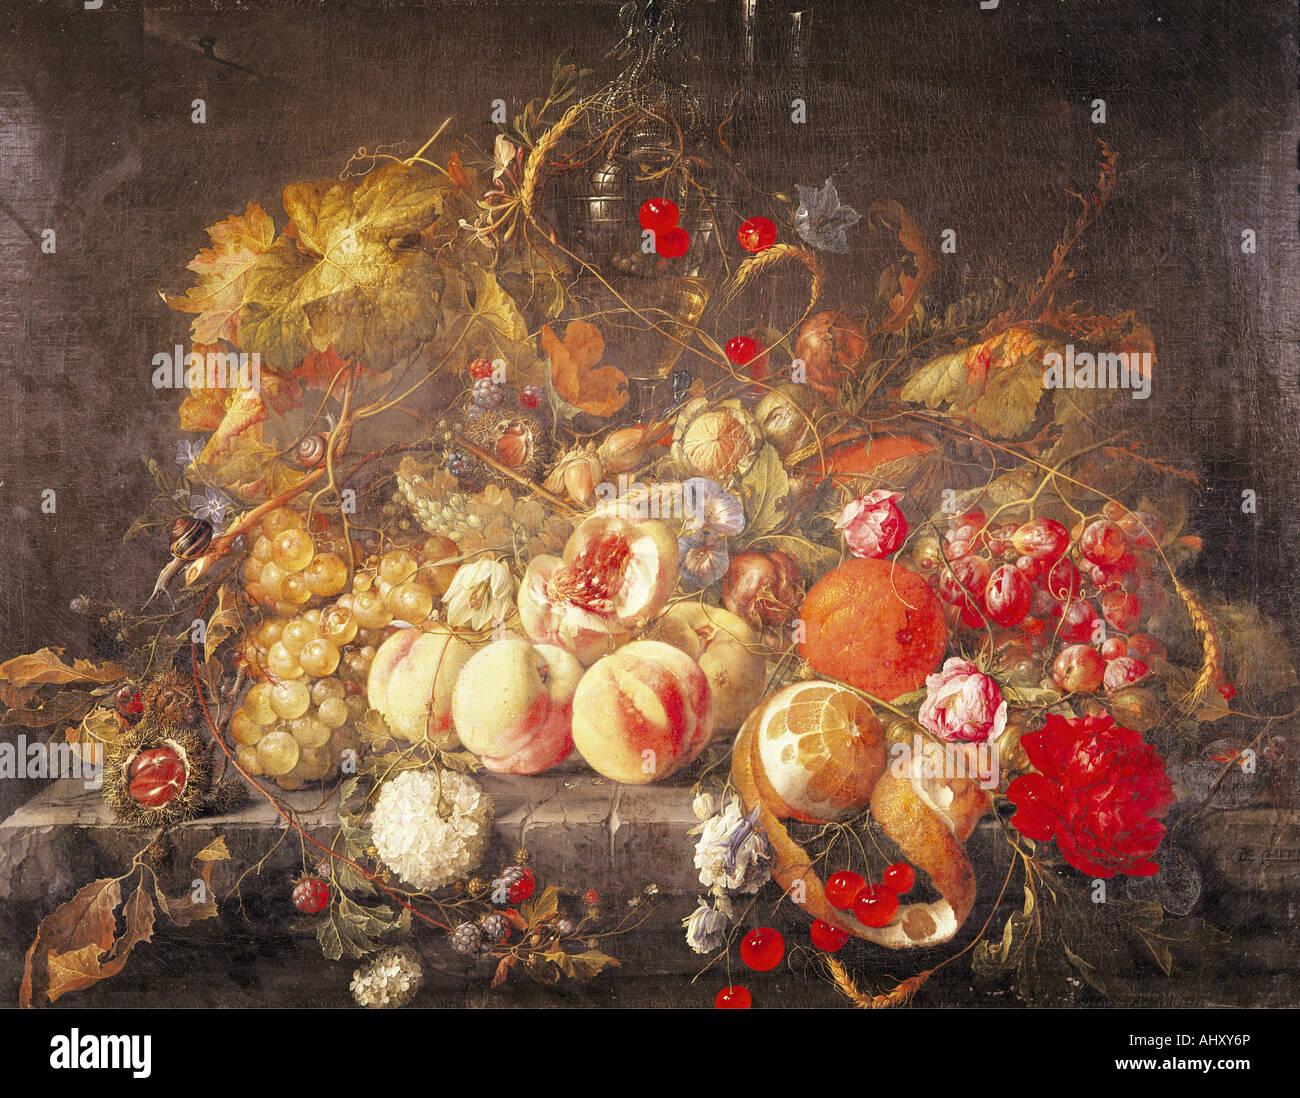 """Bellas Artes, Heem, Jan Davidsz de, (1606 - 1684), pintura, 'Still life', óleo sobre panel, 55,8 Imagen De Stock"